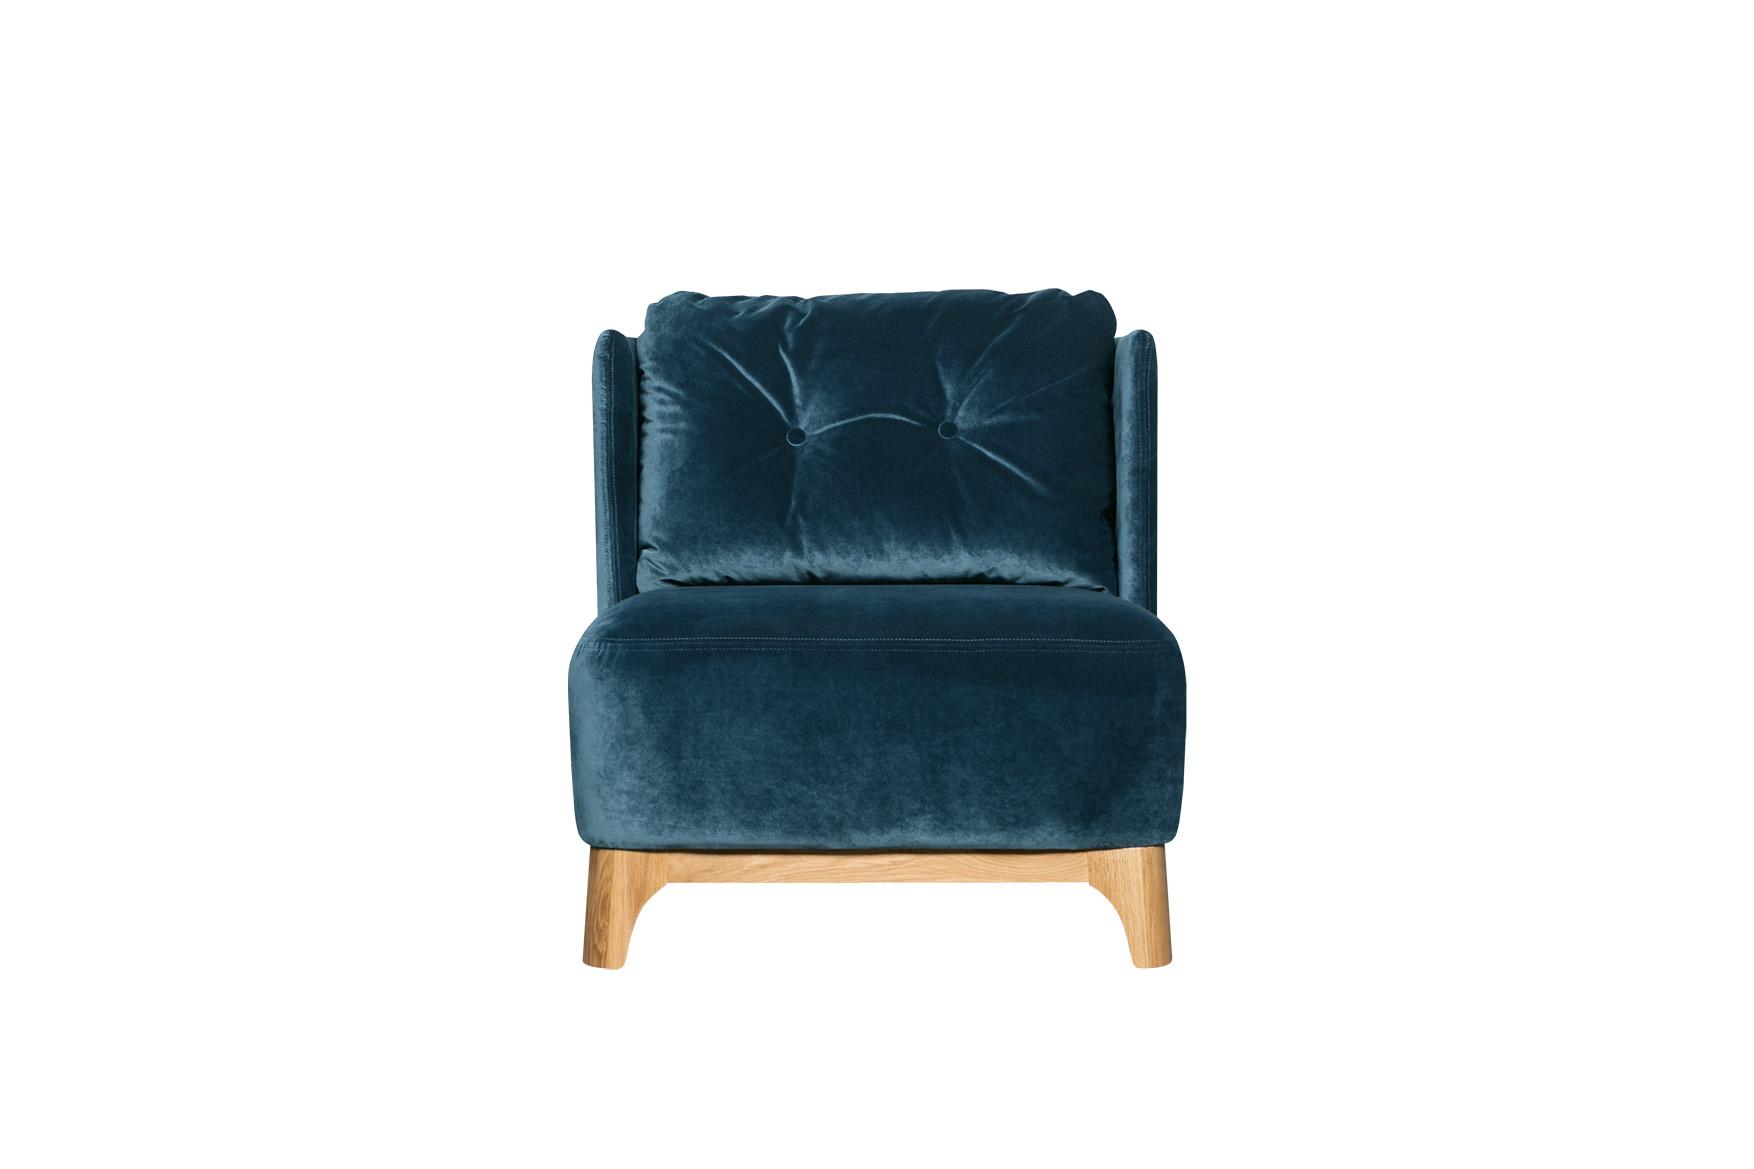 ALMA_armchair_buttons_classic_velvet12_navy_blue_1